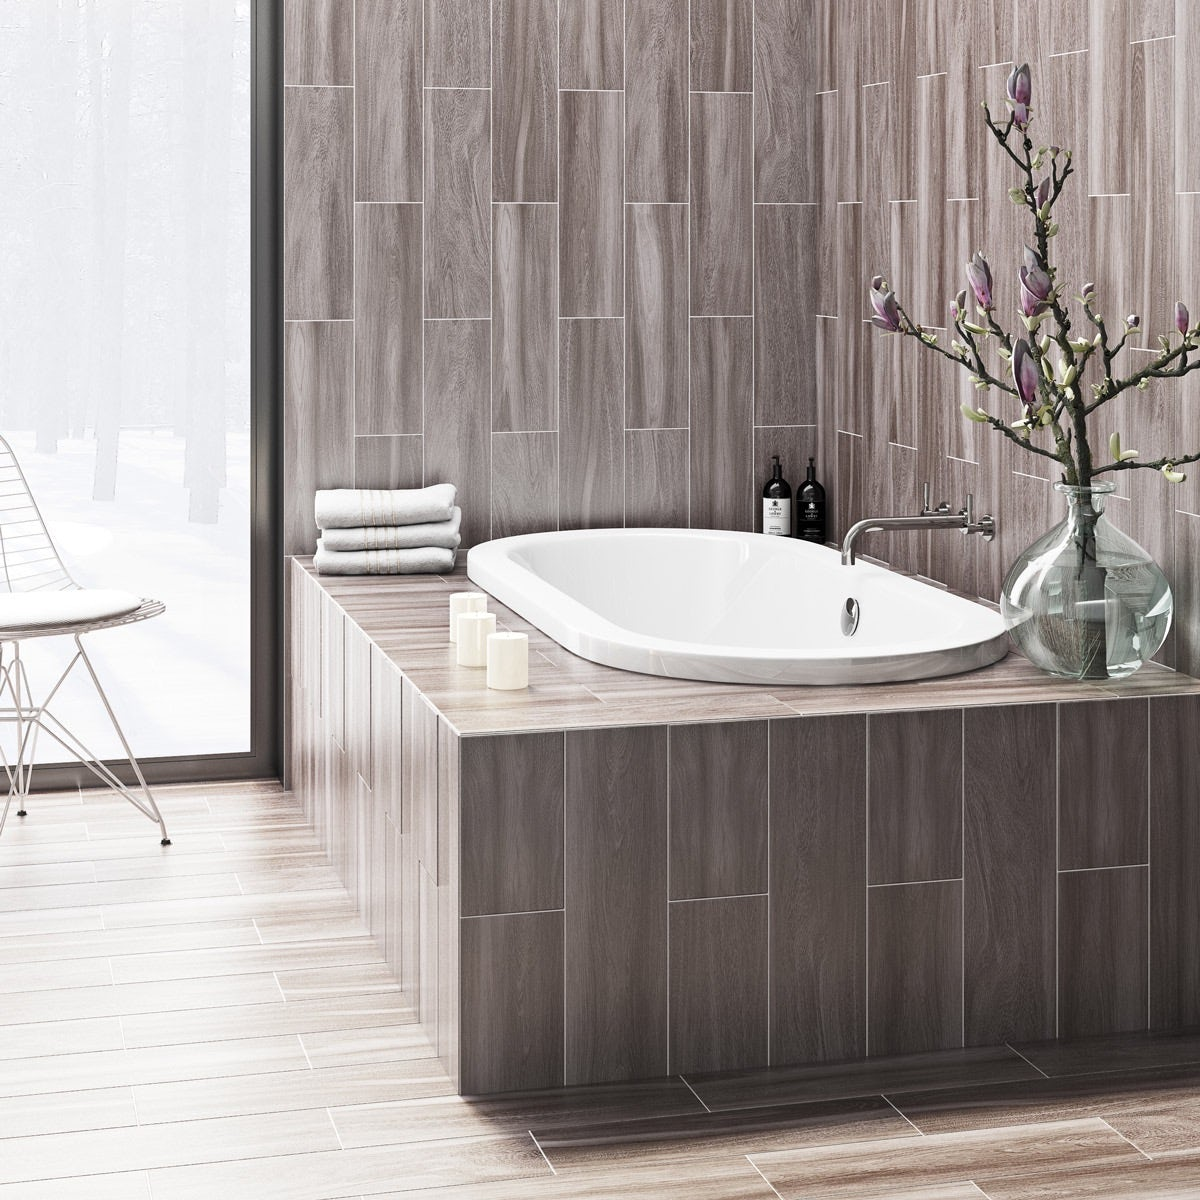 British ceramic tile bark grey wood effect grey matt tile 148mm x british ceramic tile bark grey wood effect grey matt tile 148mm x 498mm dailygadgetfo Images